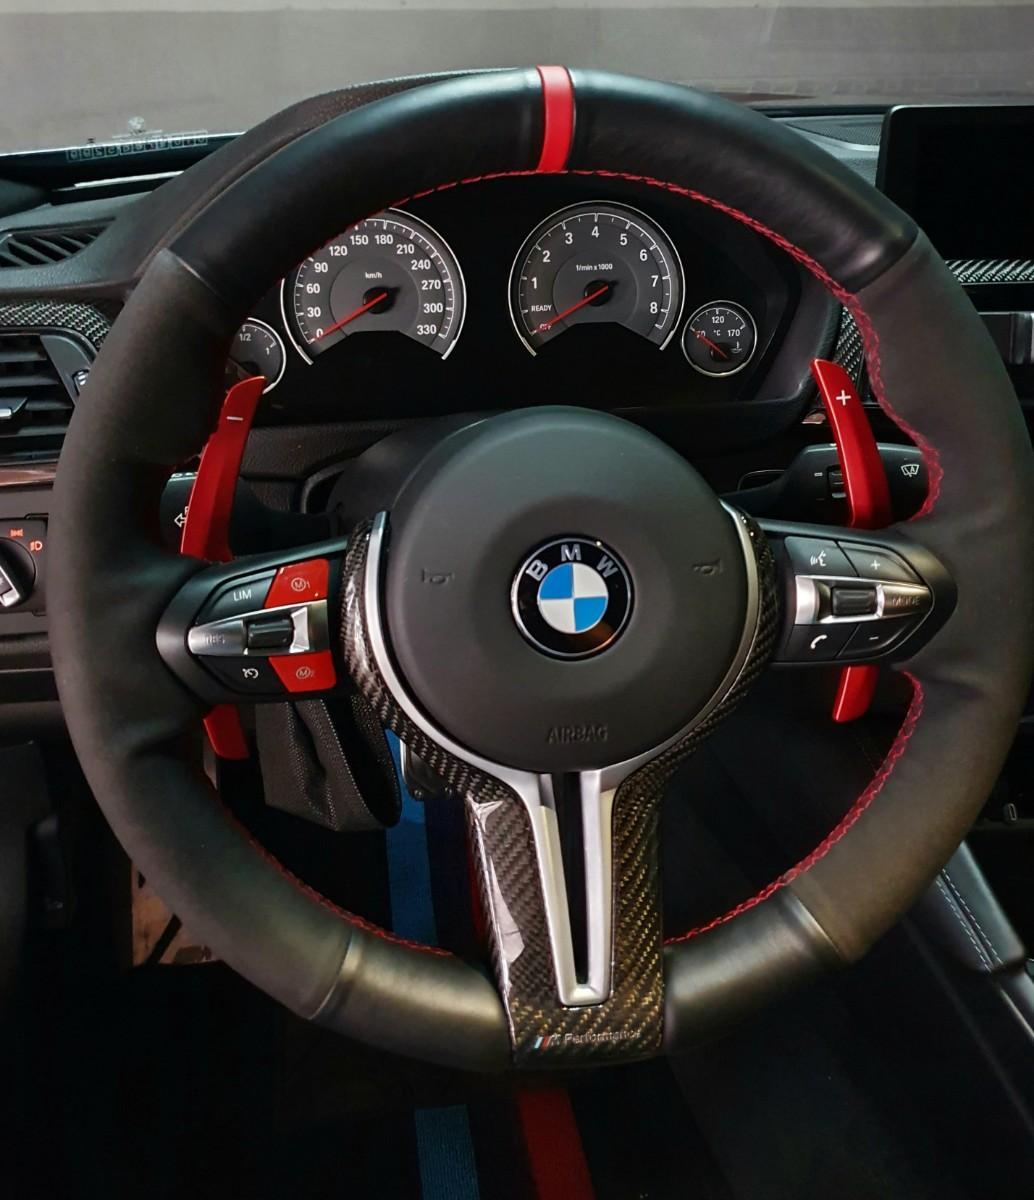 BMW m4 쿠페 (완전무사고) - 6